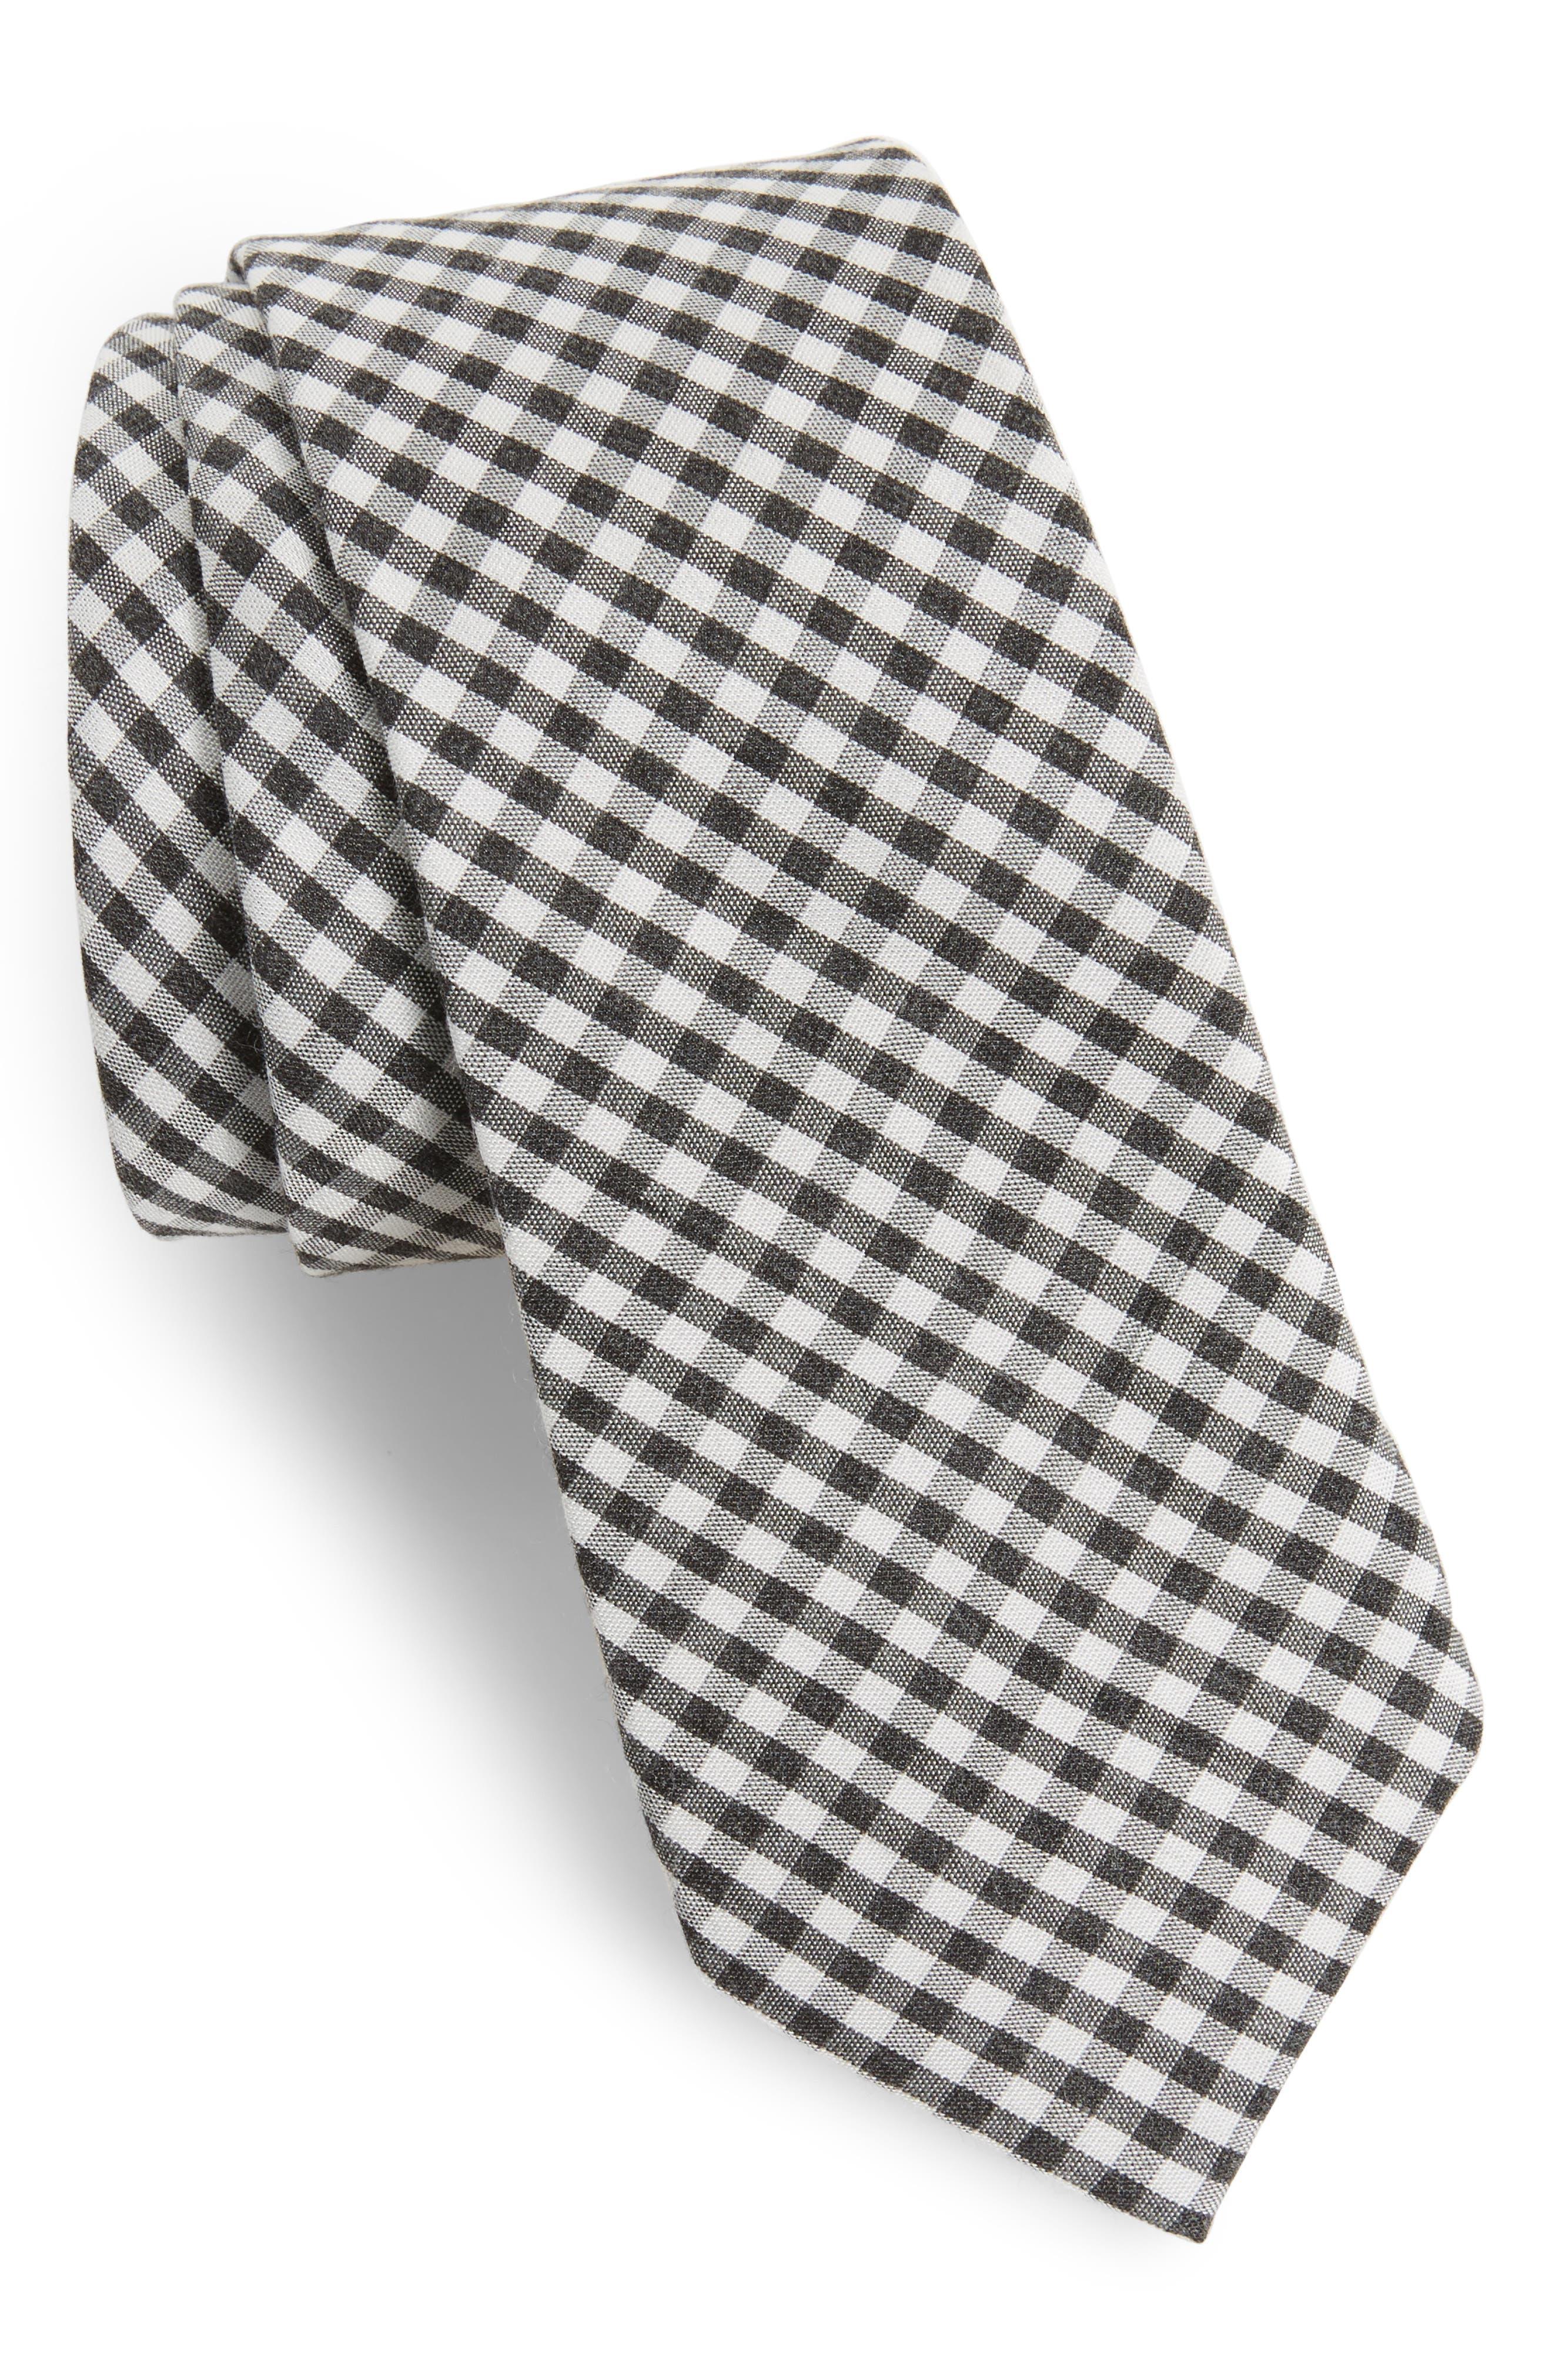 Cahill Check Skinny Tie,                         Main,                         color, Black